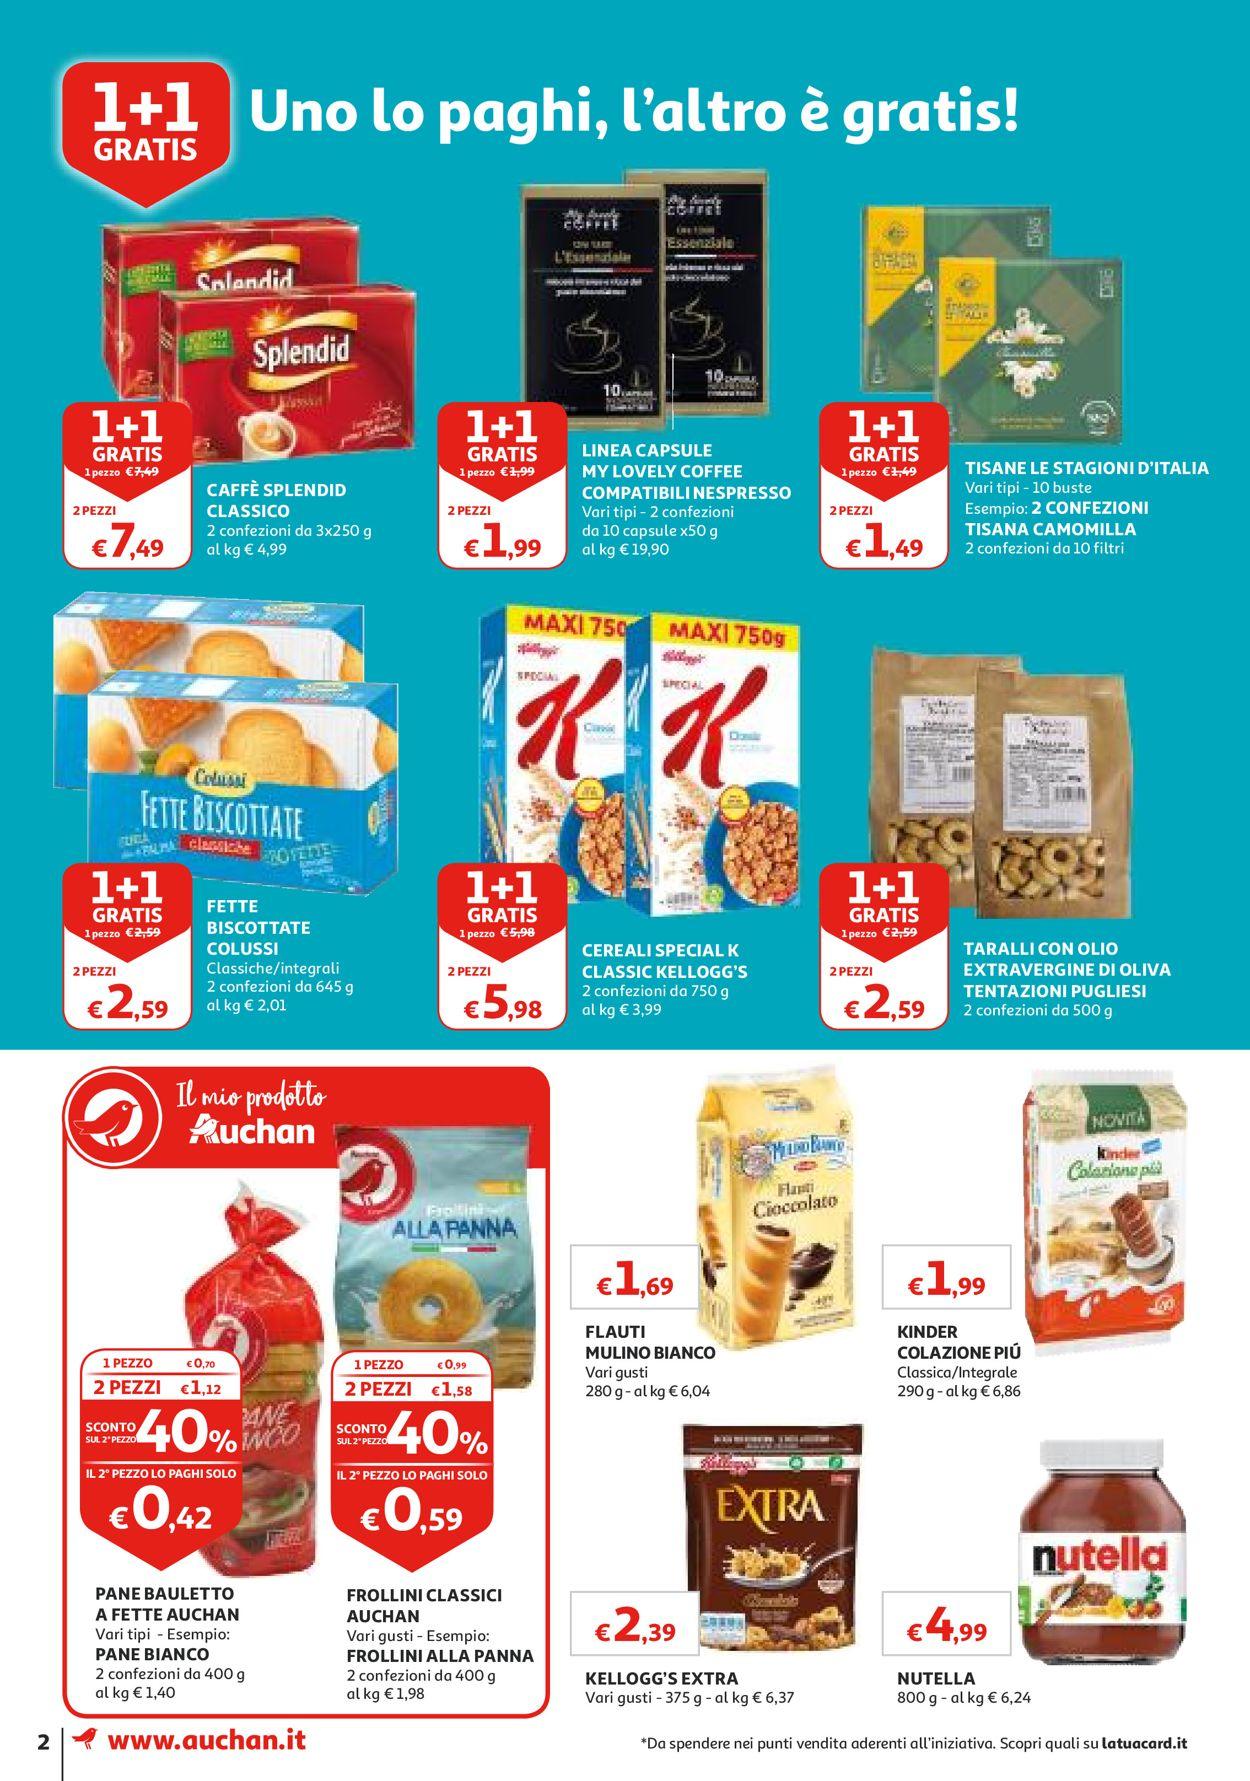 Volantino Auchan - Offerte 23/07-31/07/2019 (Pagina 2)